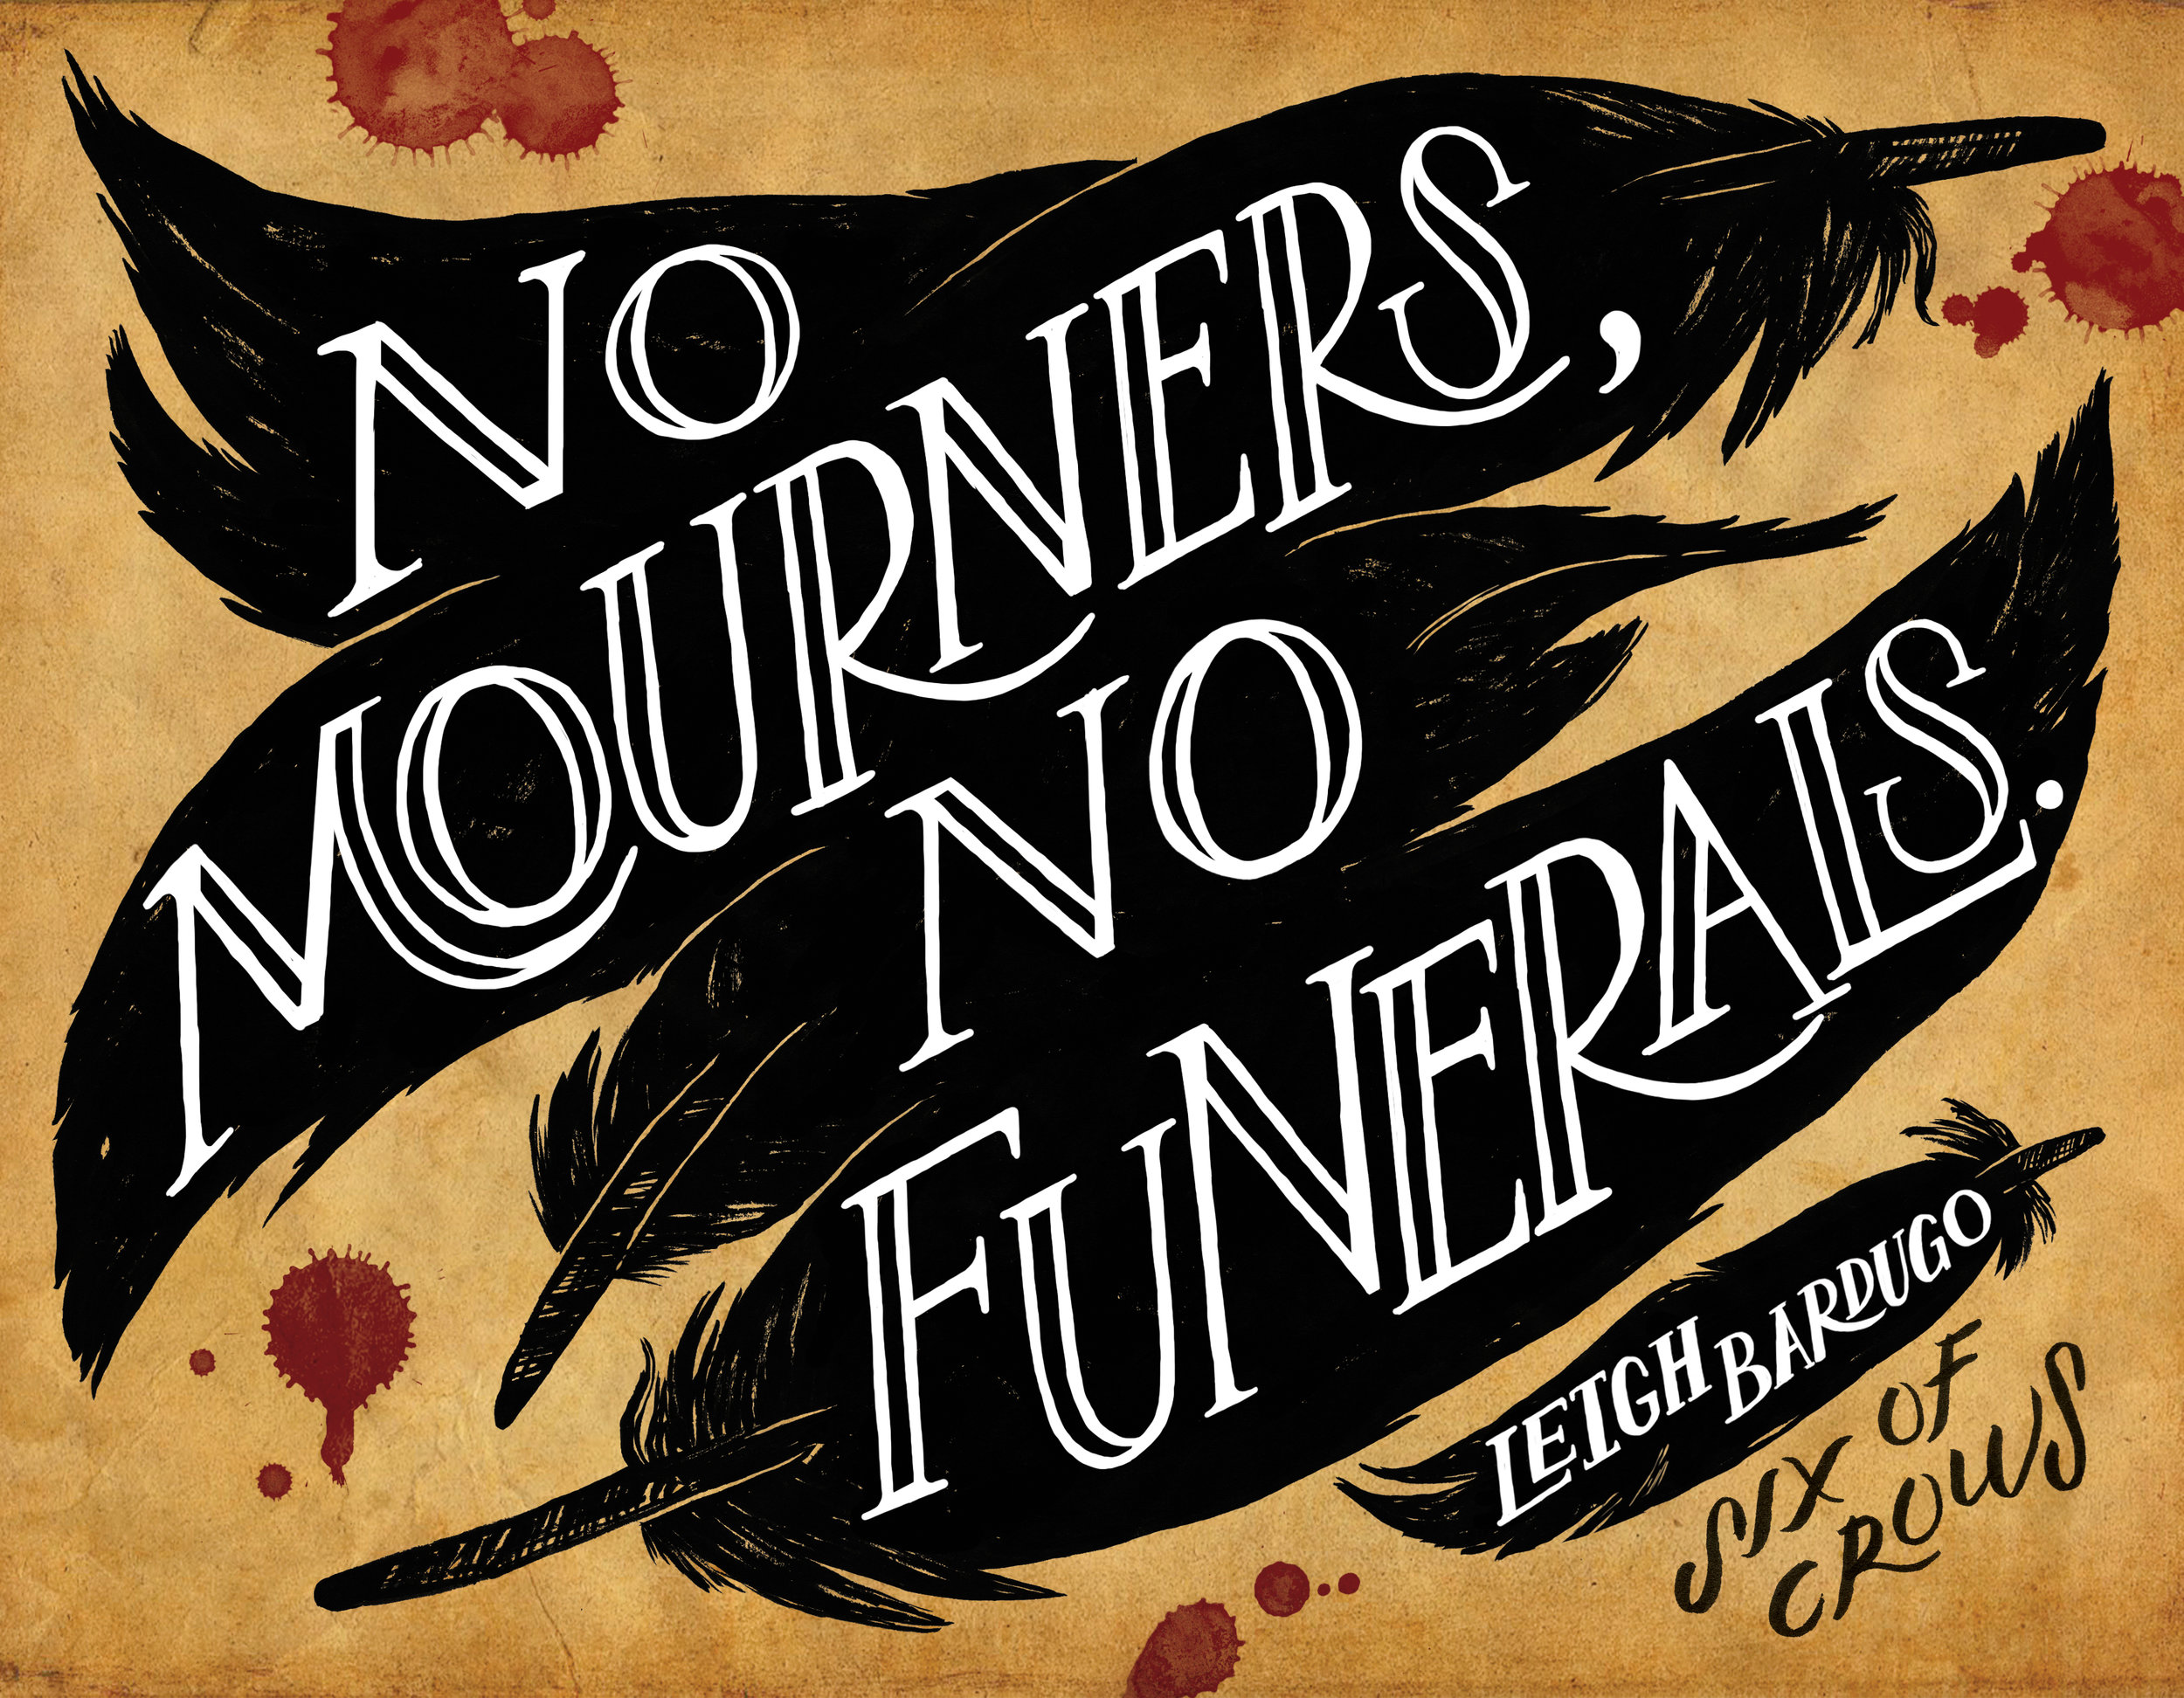 No Mourners, No Funerals